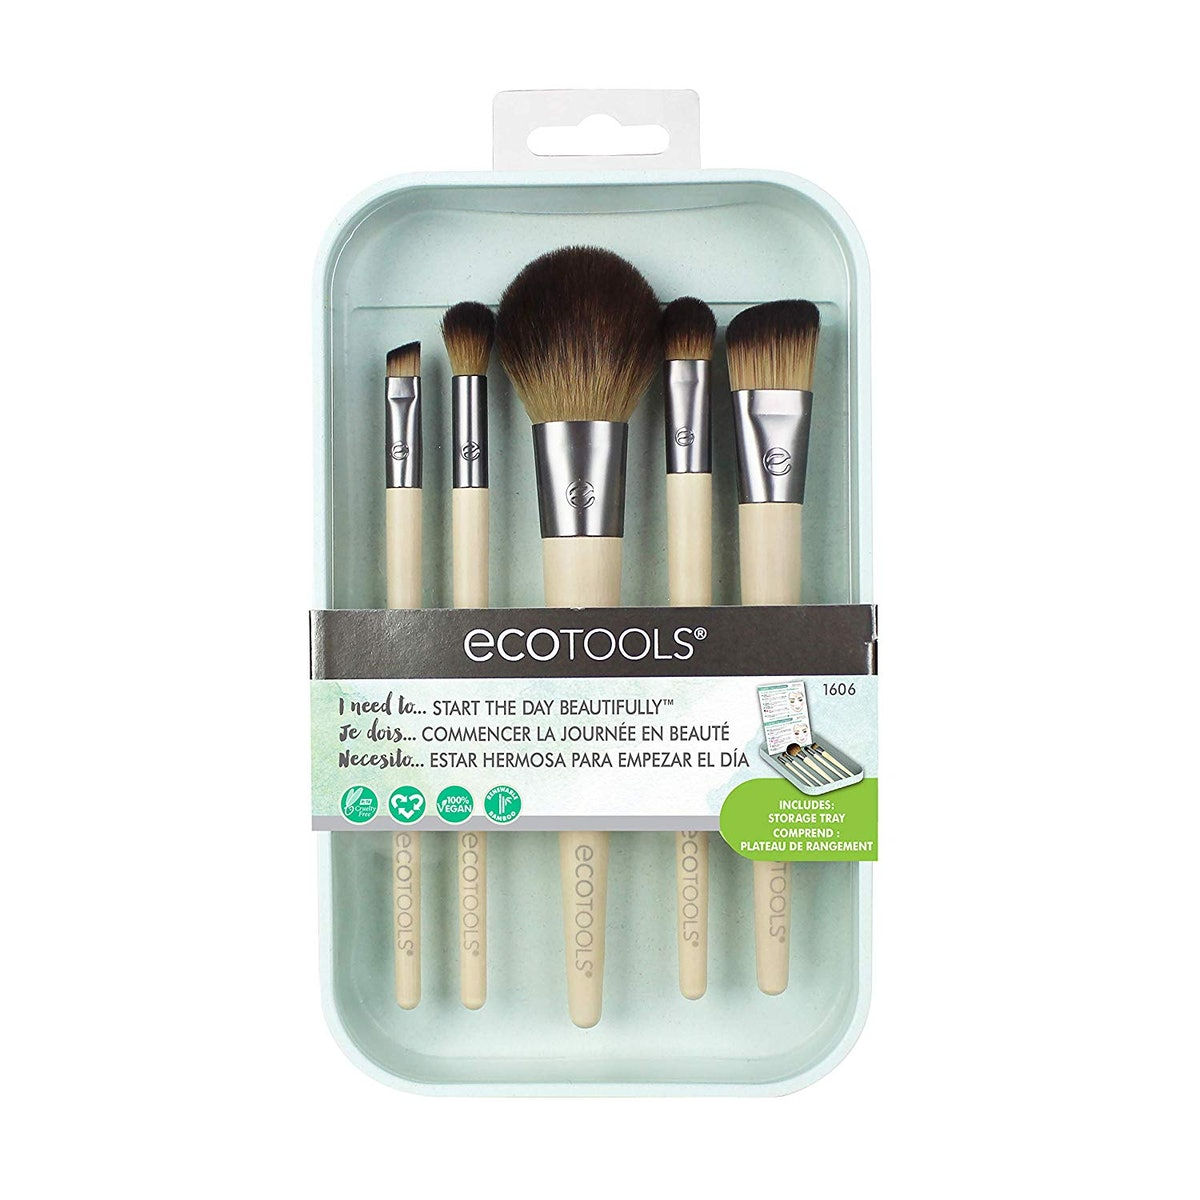 EcoTools Start The Day Beautifully Makeup Brush Kit (5-Pack)